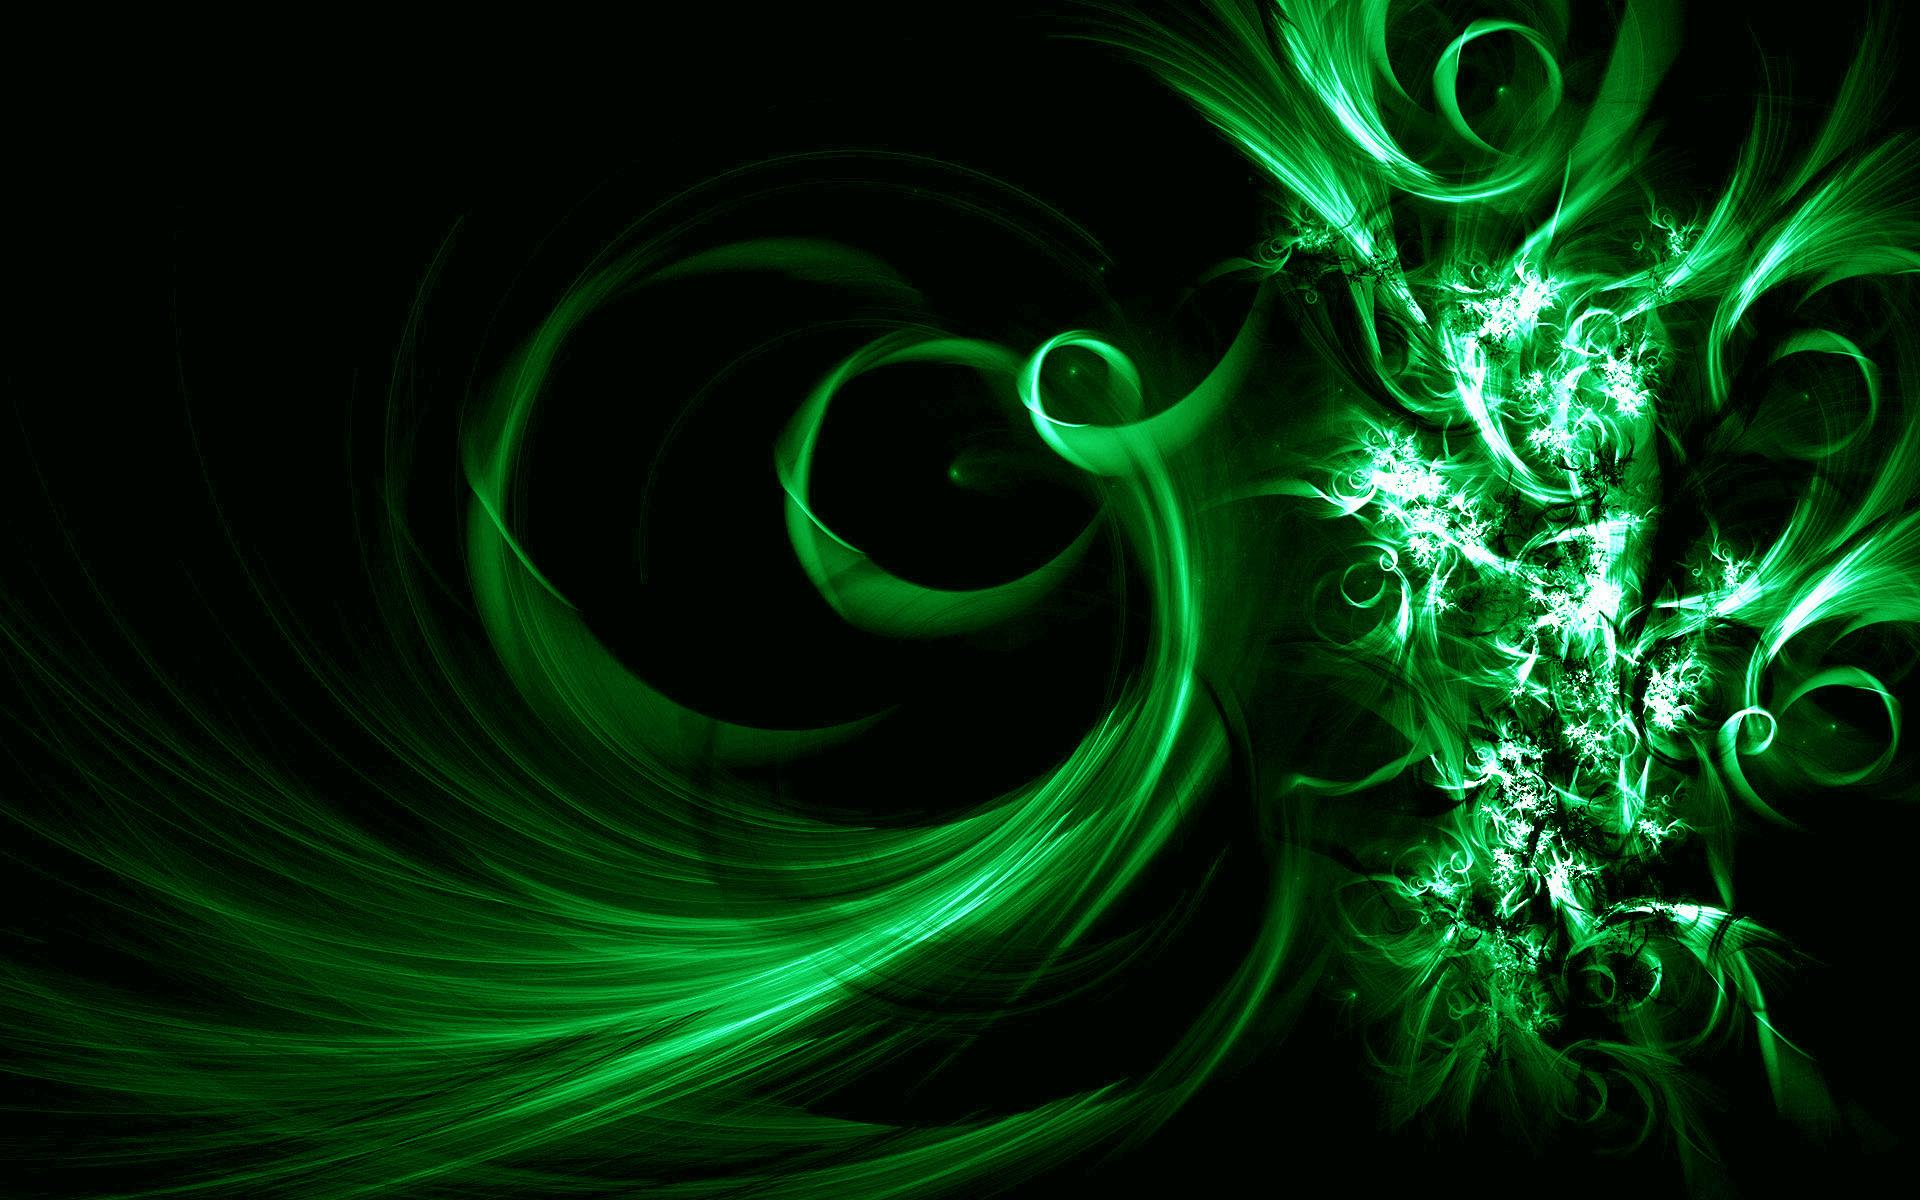 Image Description: This is Black and Green Vector Abstract Desktop Wallpaper  in Buubi.com